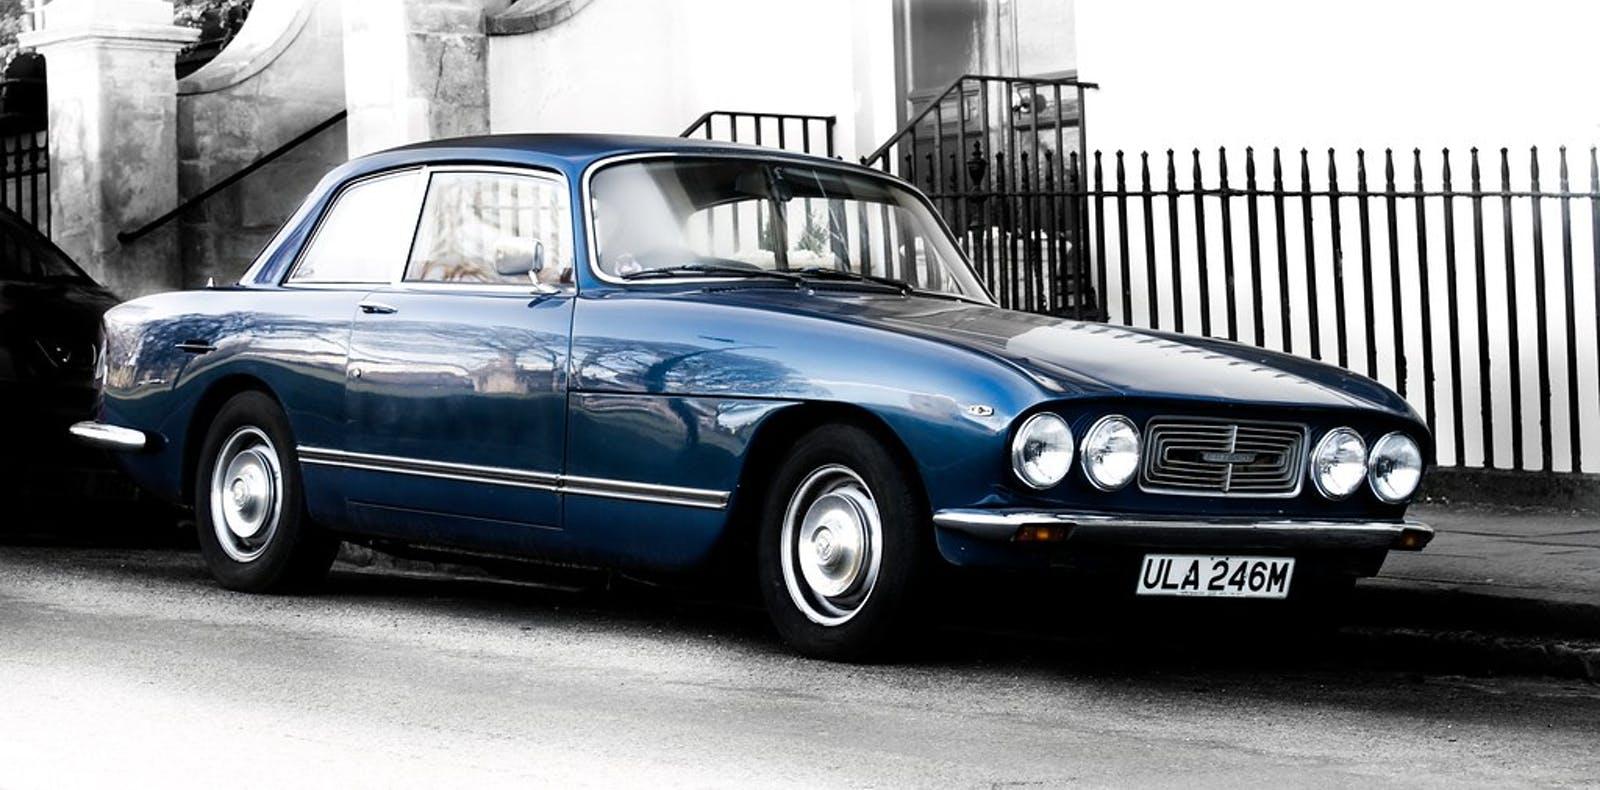 Bristol cars - 1